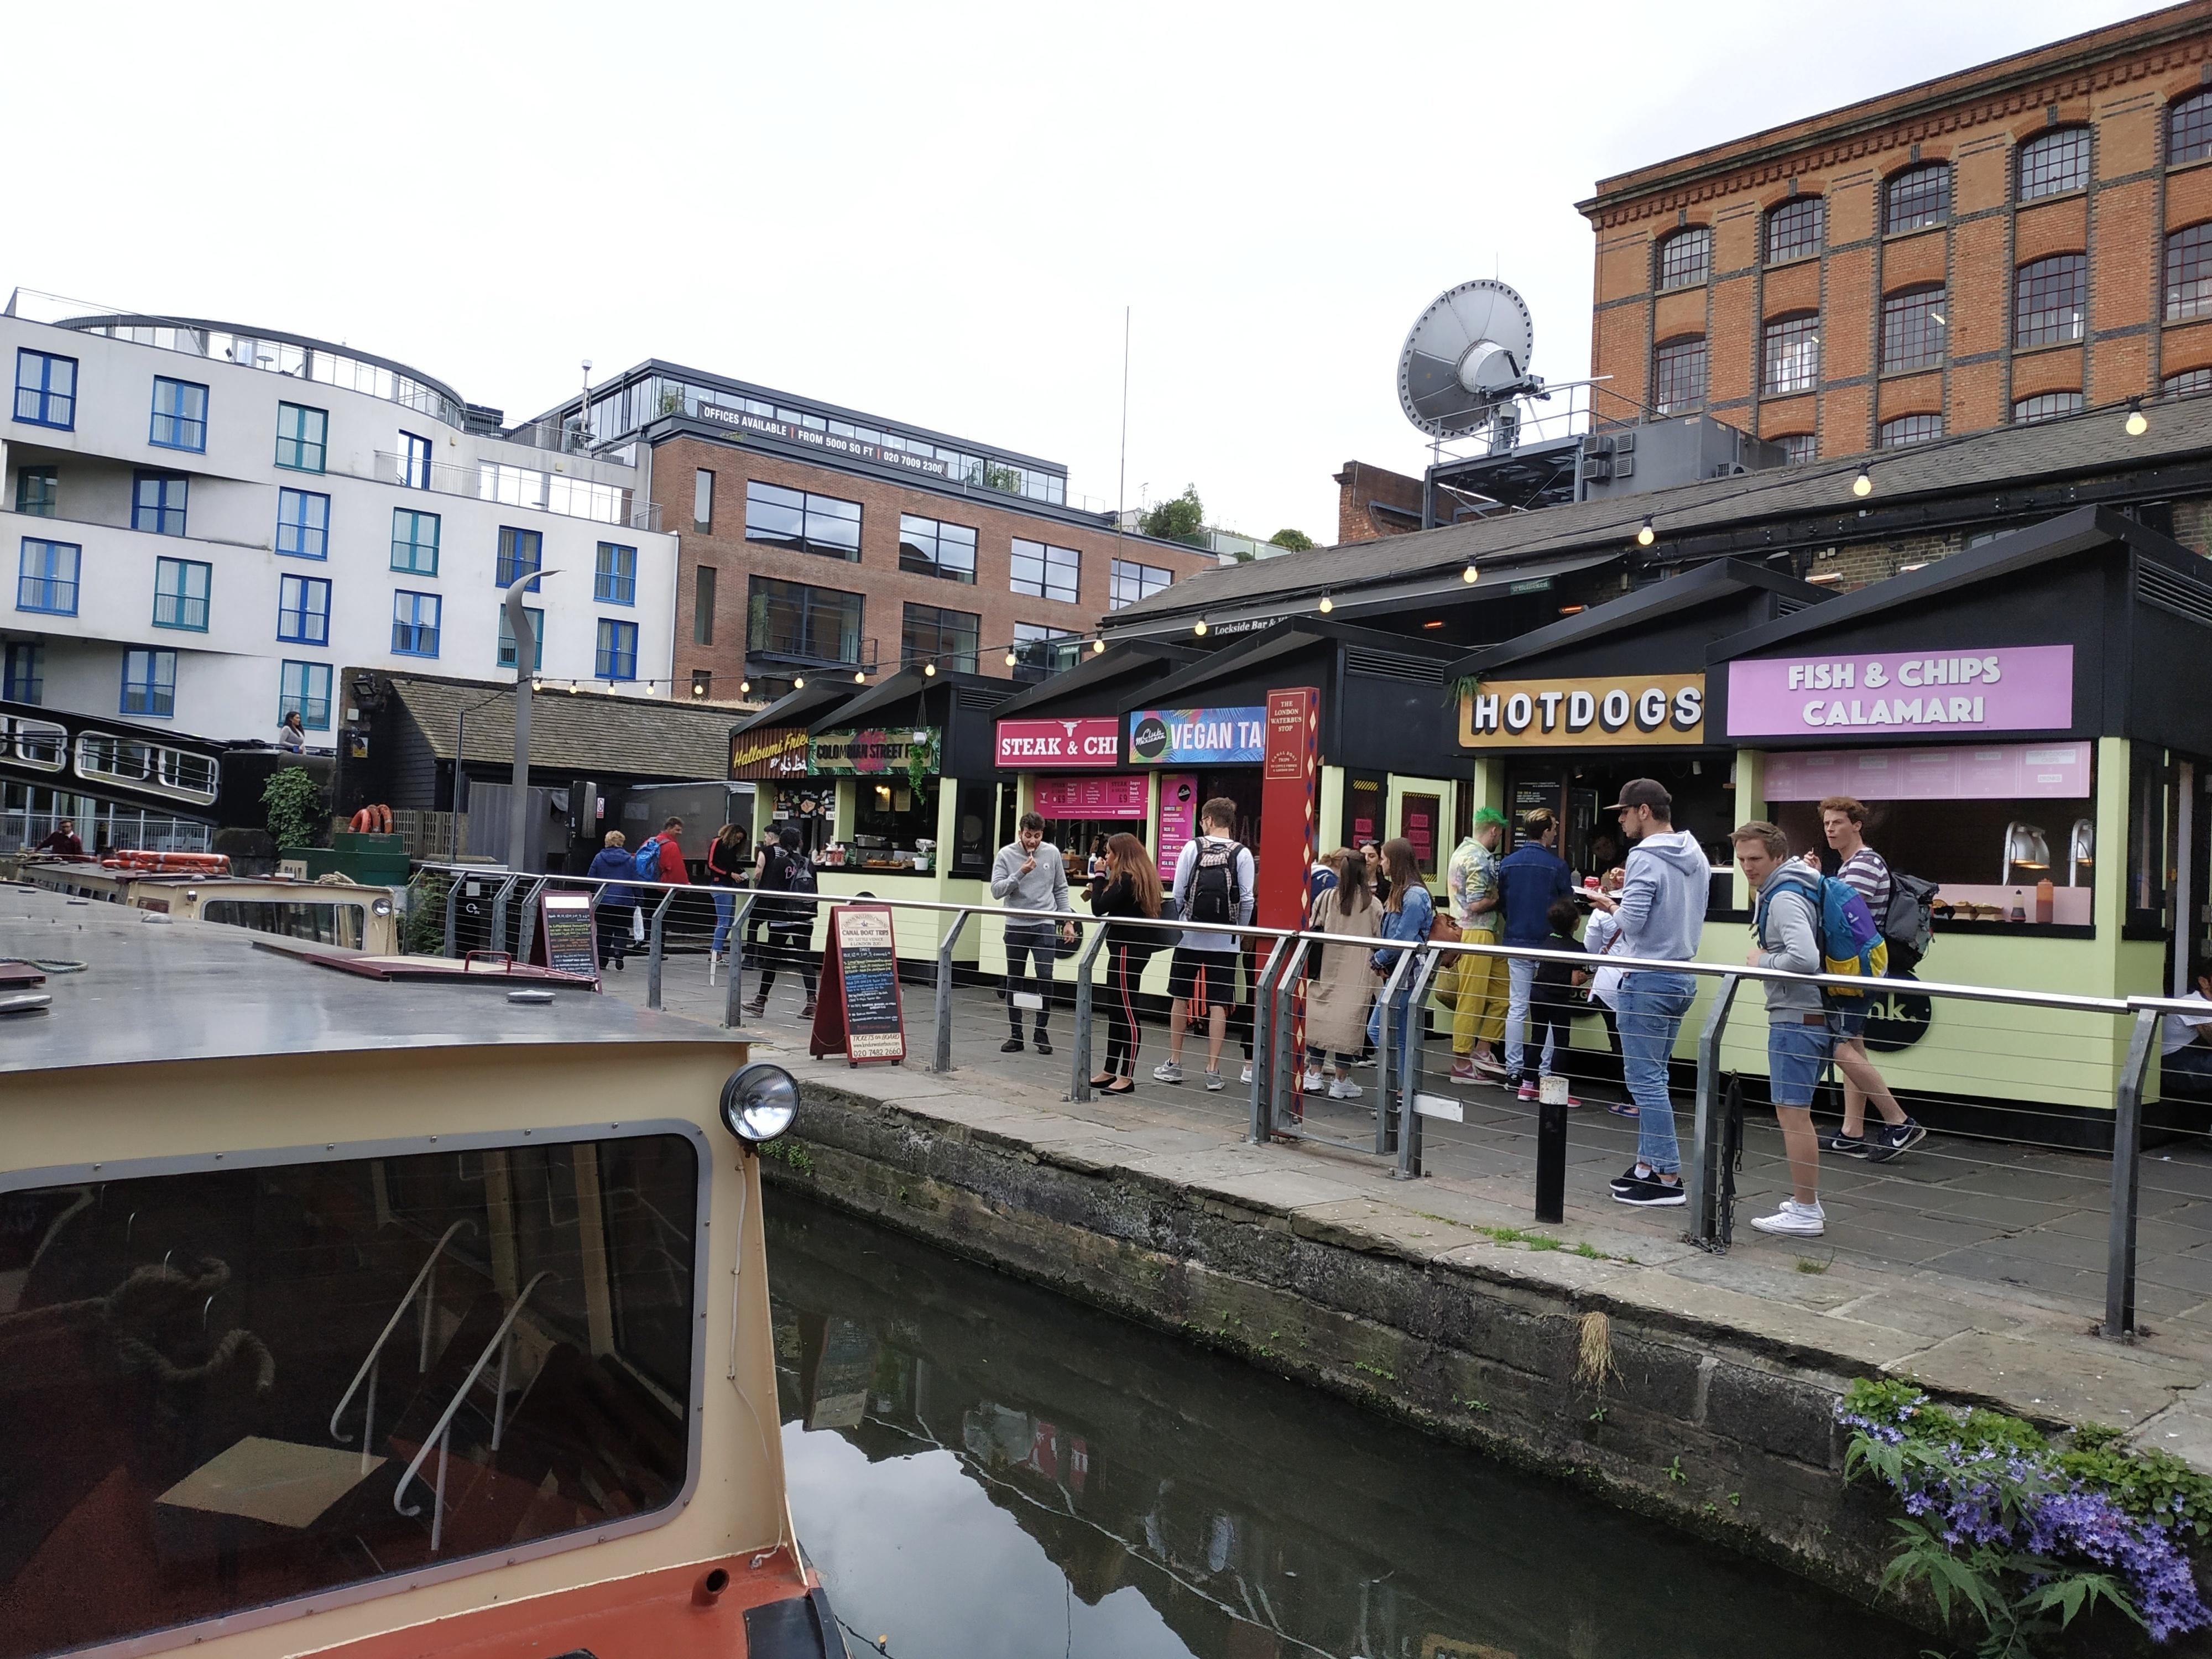 Candem, mejores barrios de Londres donde vivir